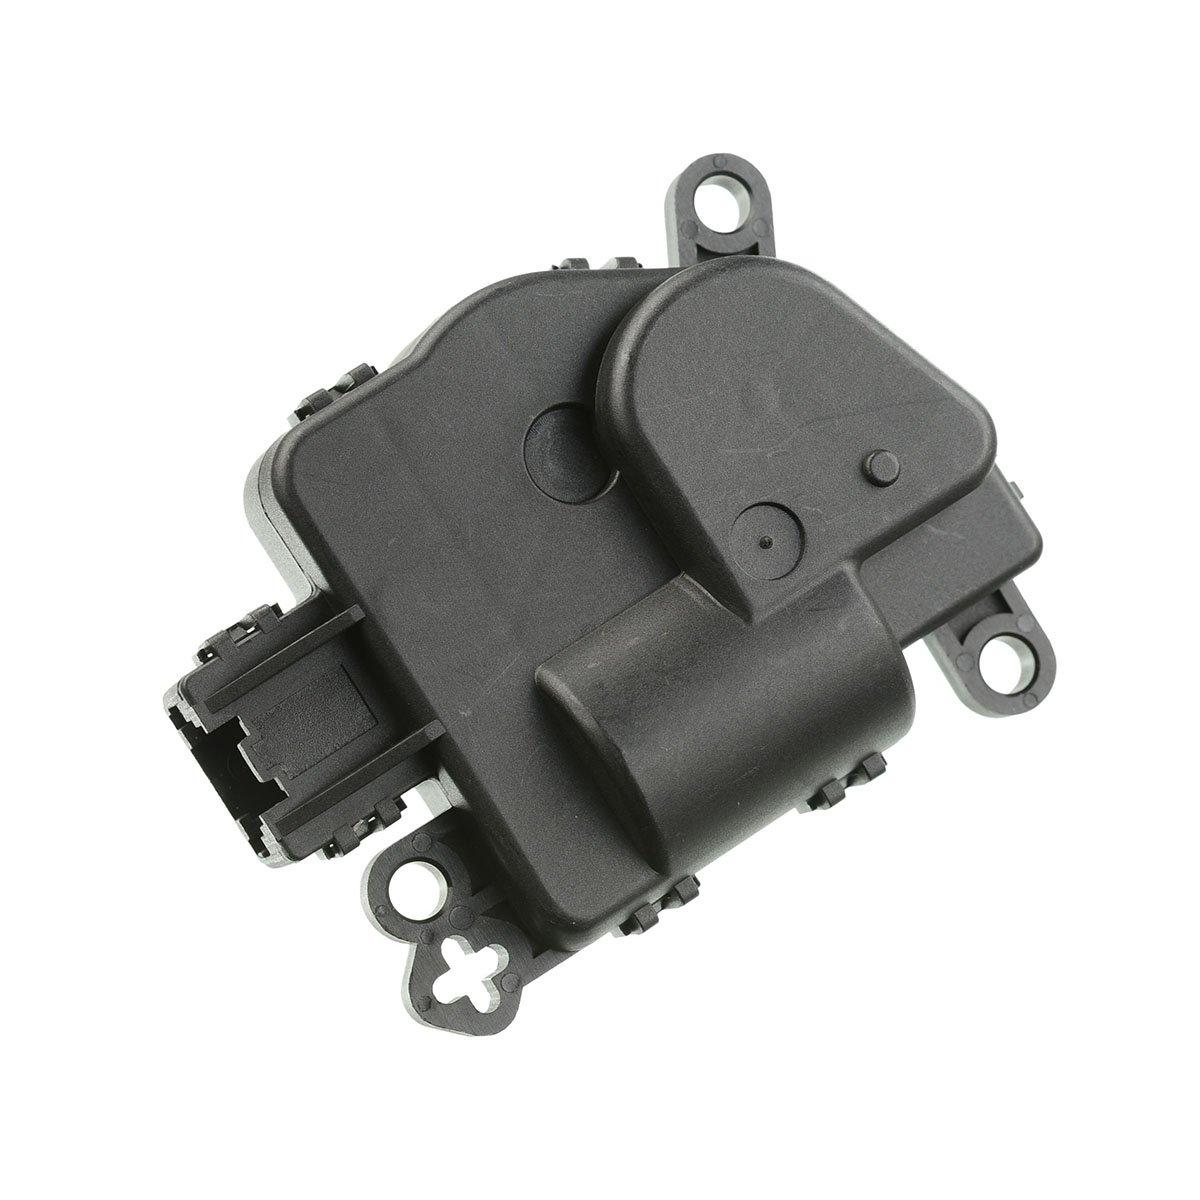 A-Premium HVAC Heater Air Blend Door Actuator for Dodge Ram 1500 2500 3500 4500 5500